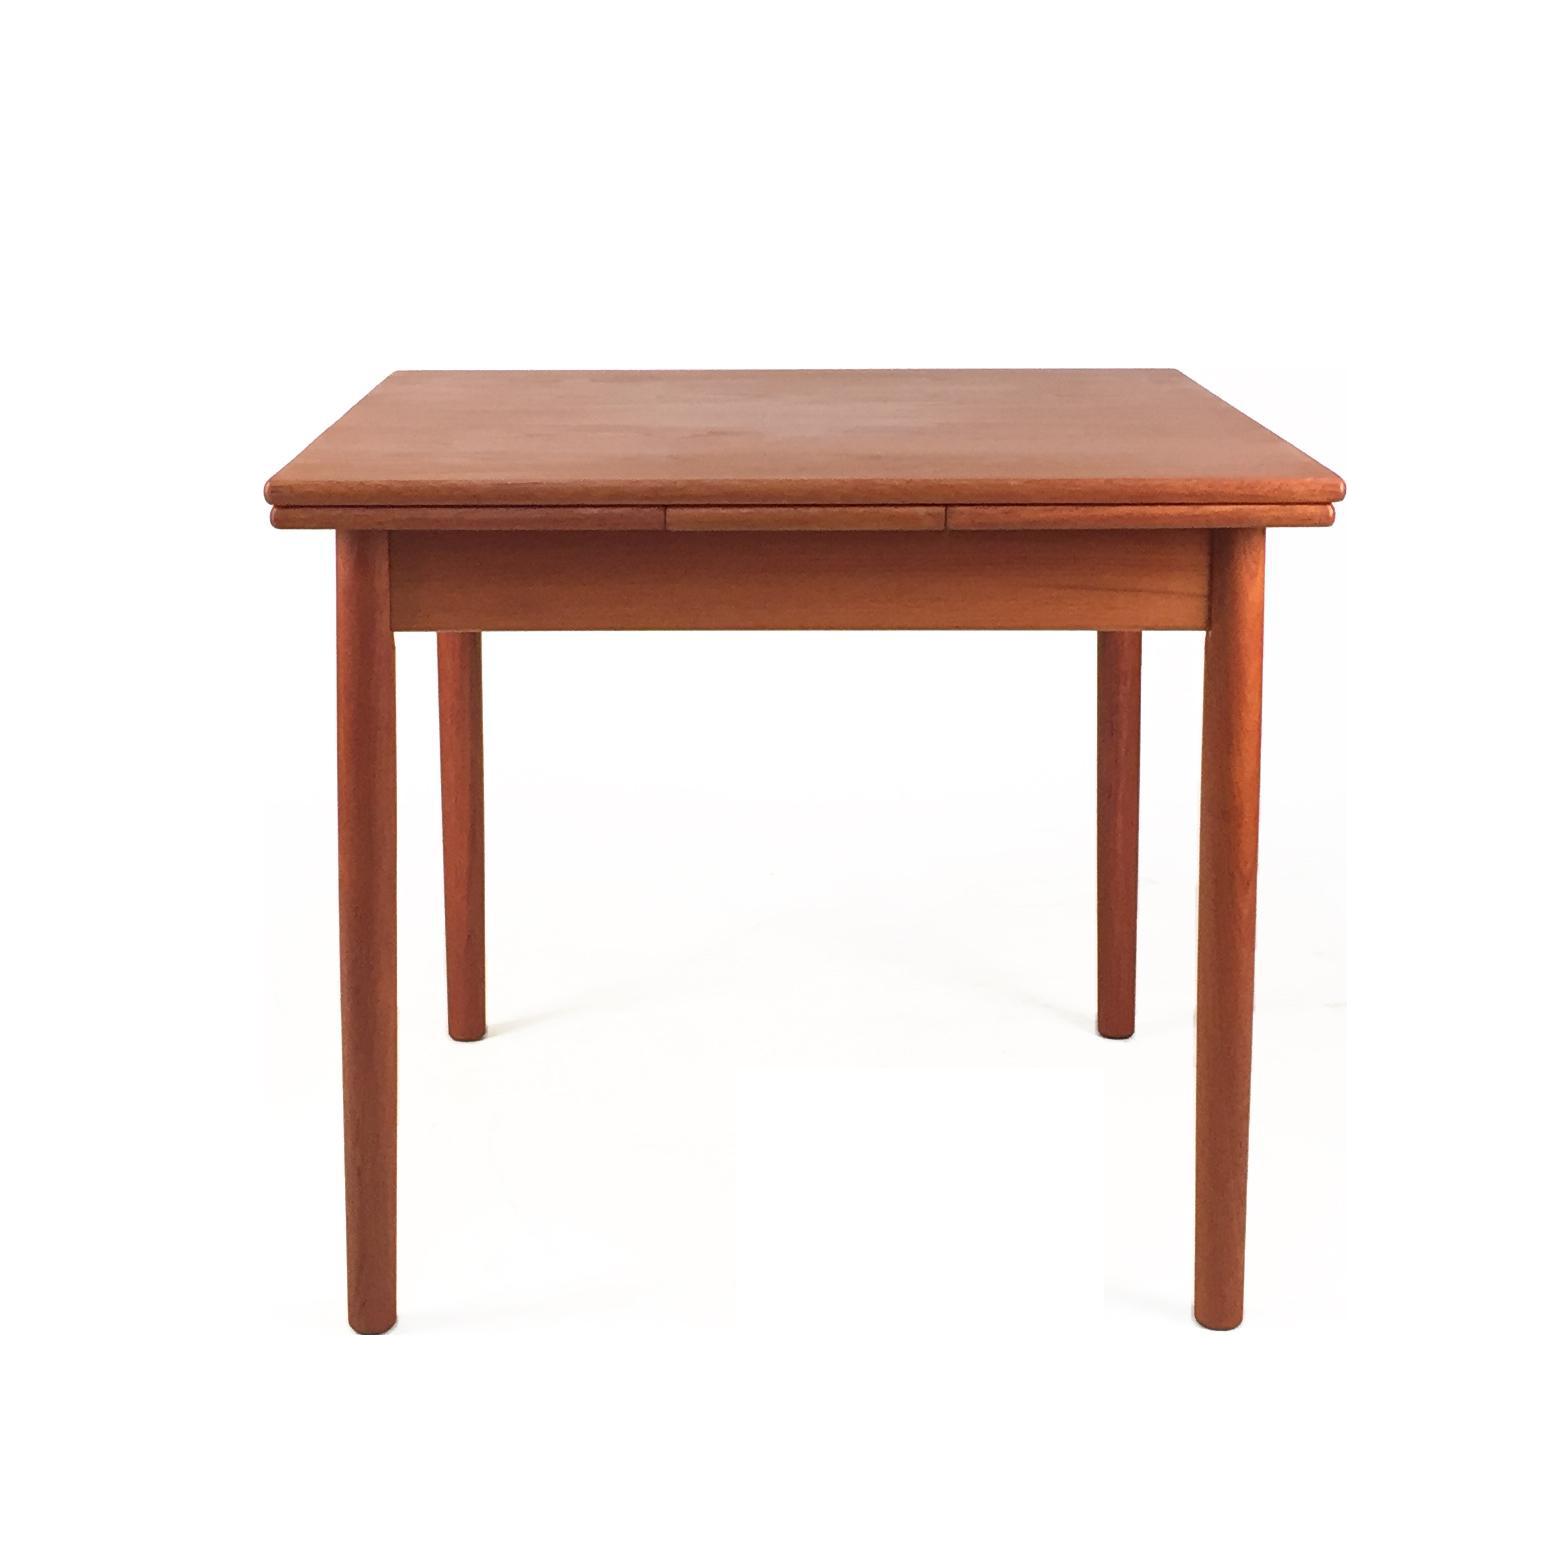 1960s Danish Modern Teak Square Dining Table